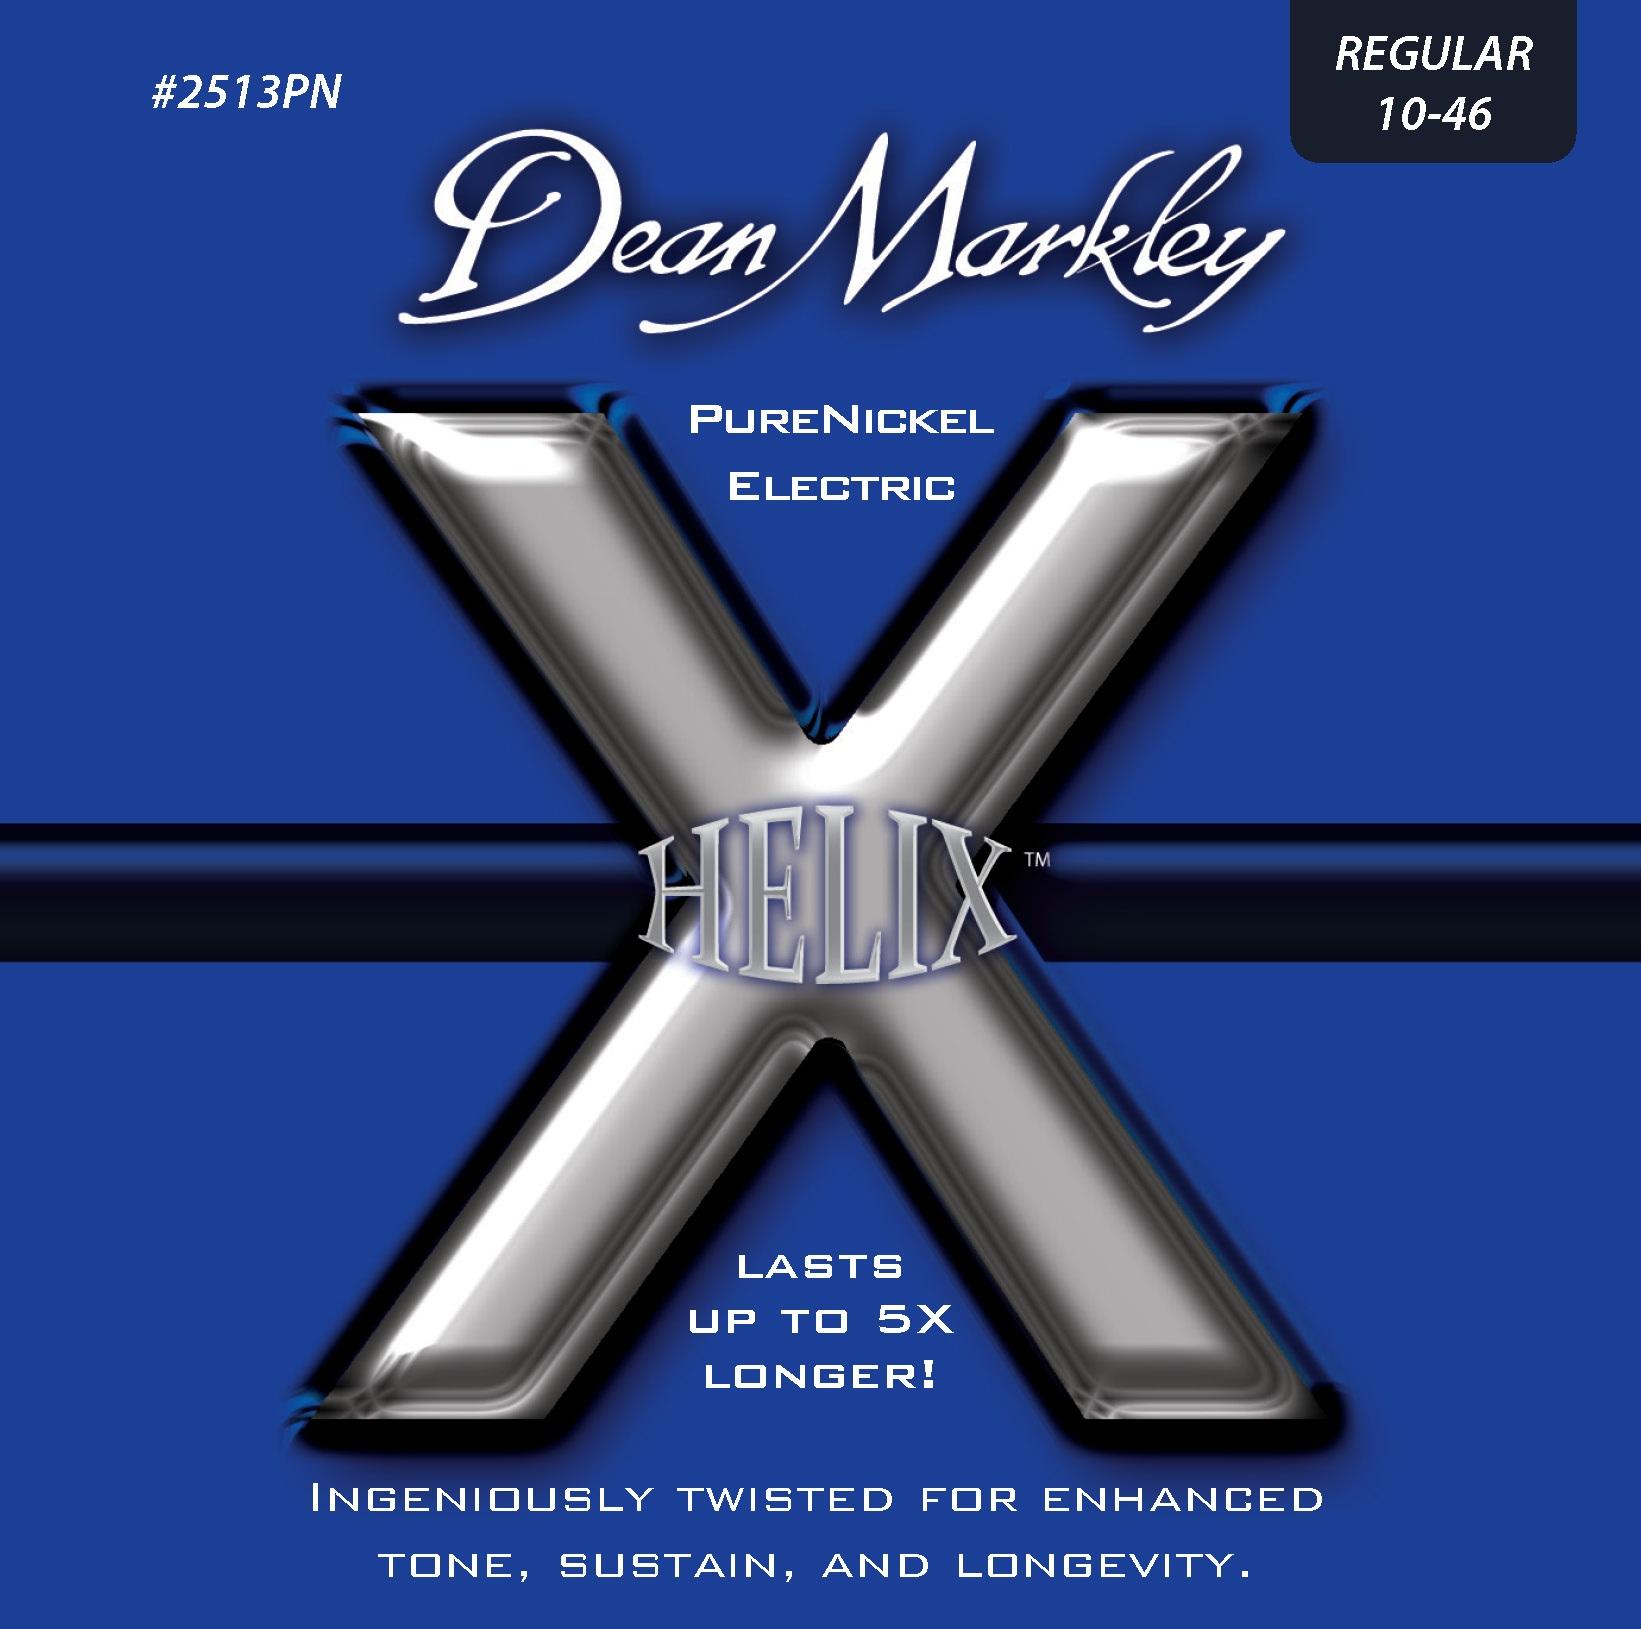 Dean Markley 2513PN REG 10-46 Helix PureNickel